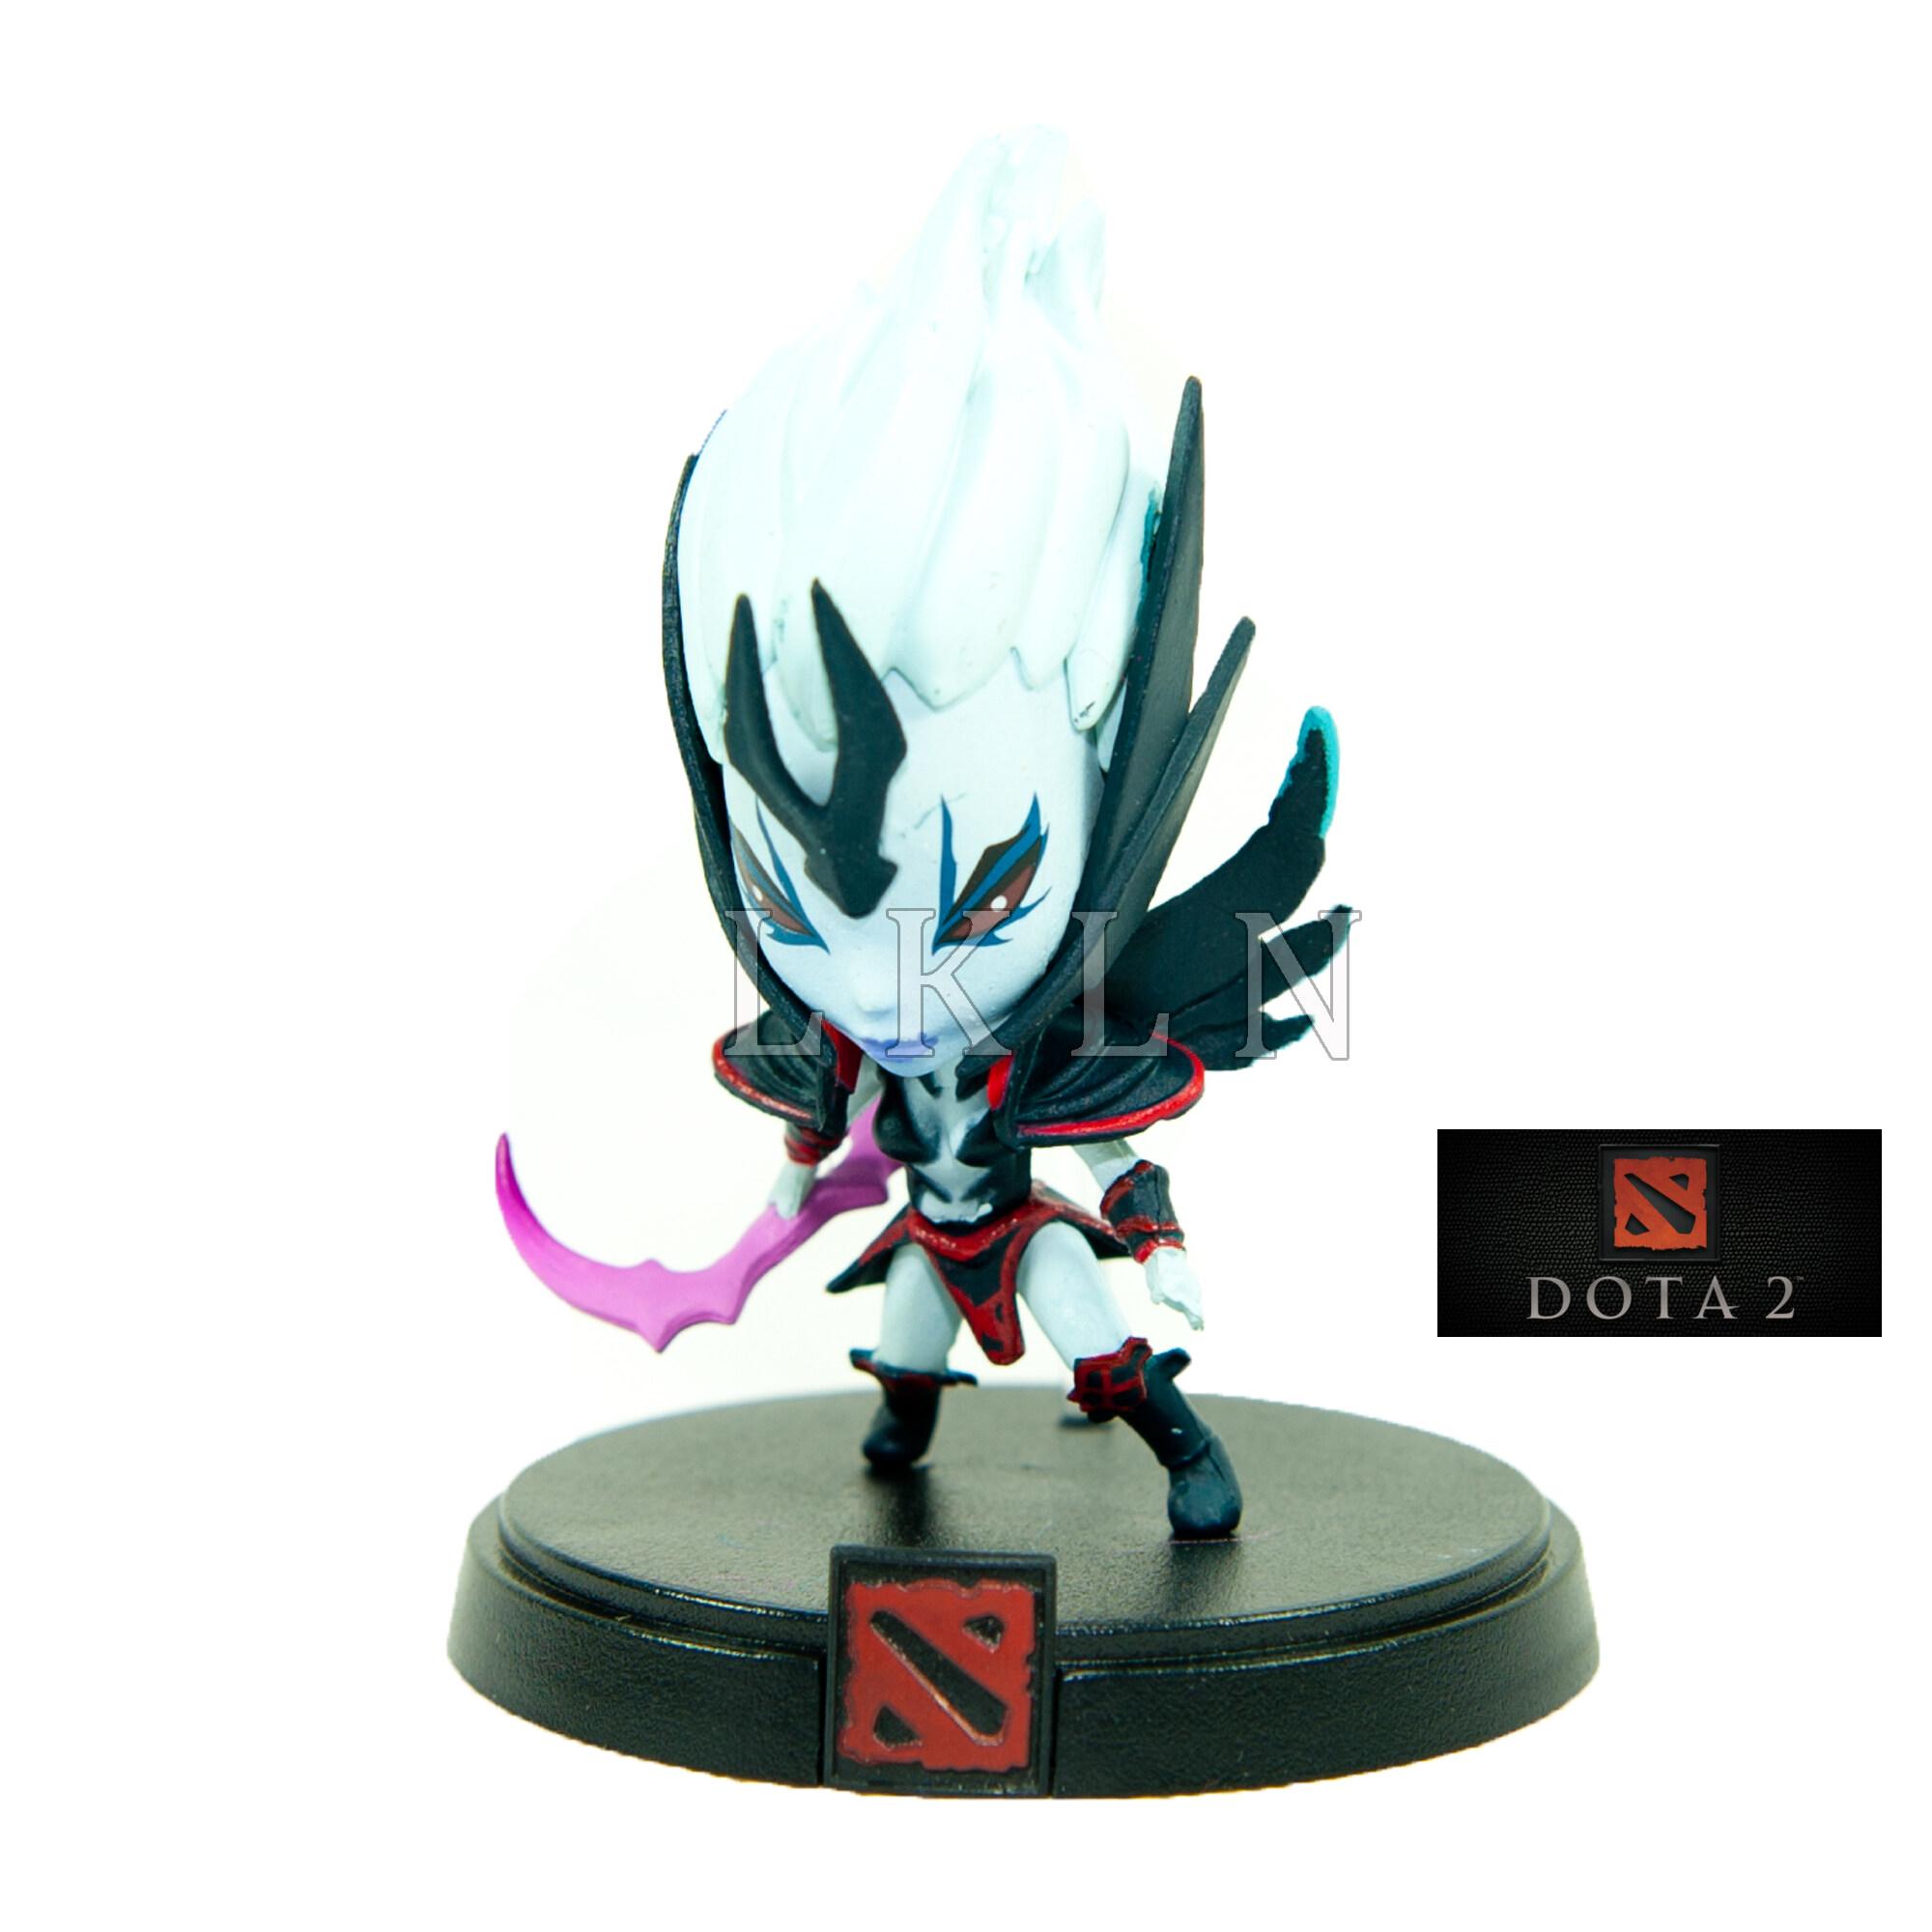 dota 2 vengeful spirit action figures collection toys lazada